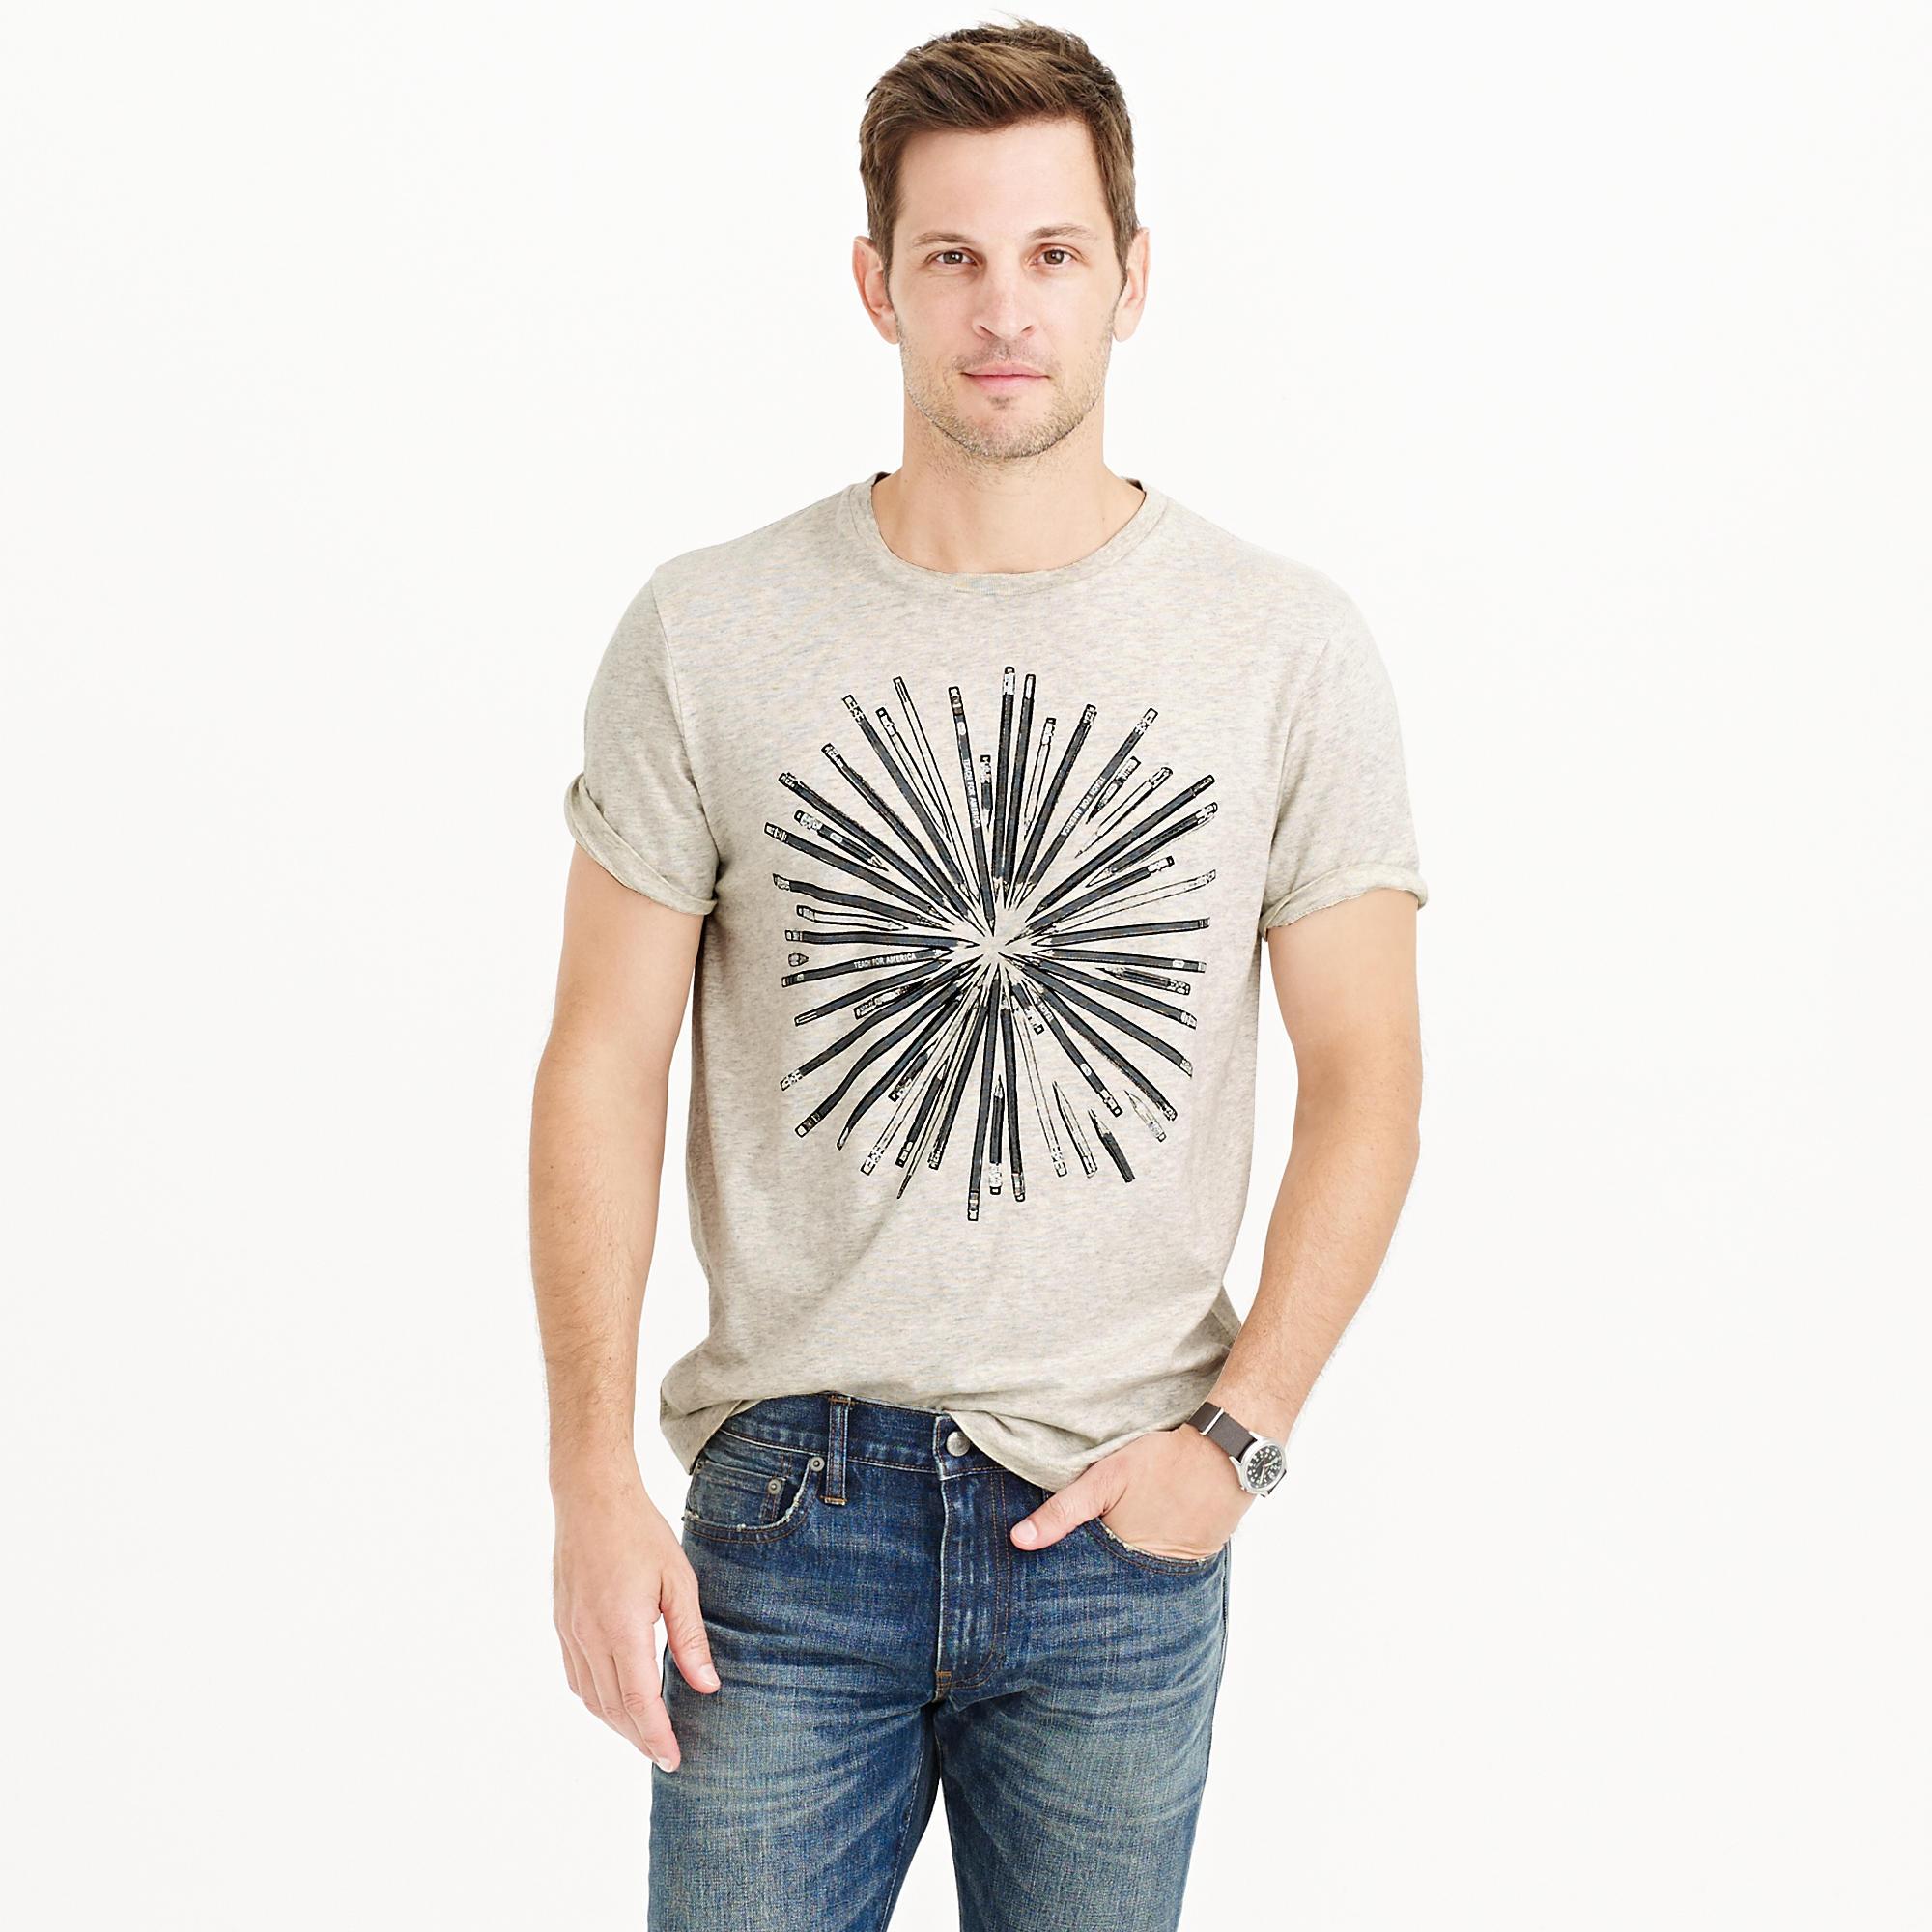 Teach for America T-Shirt